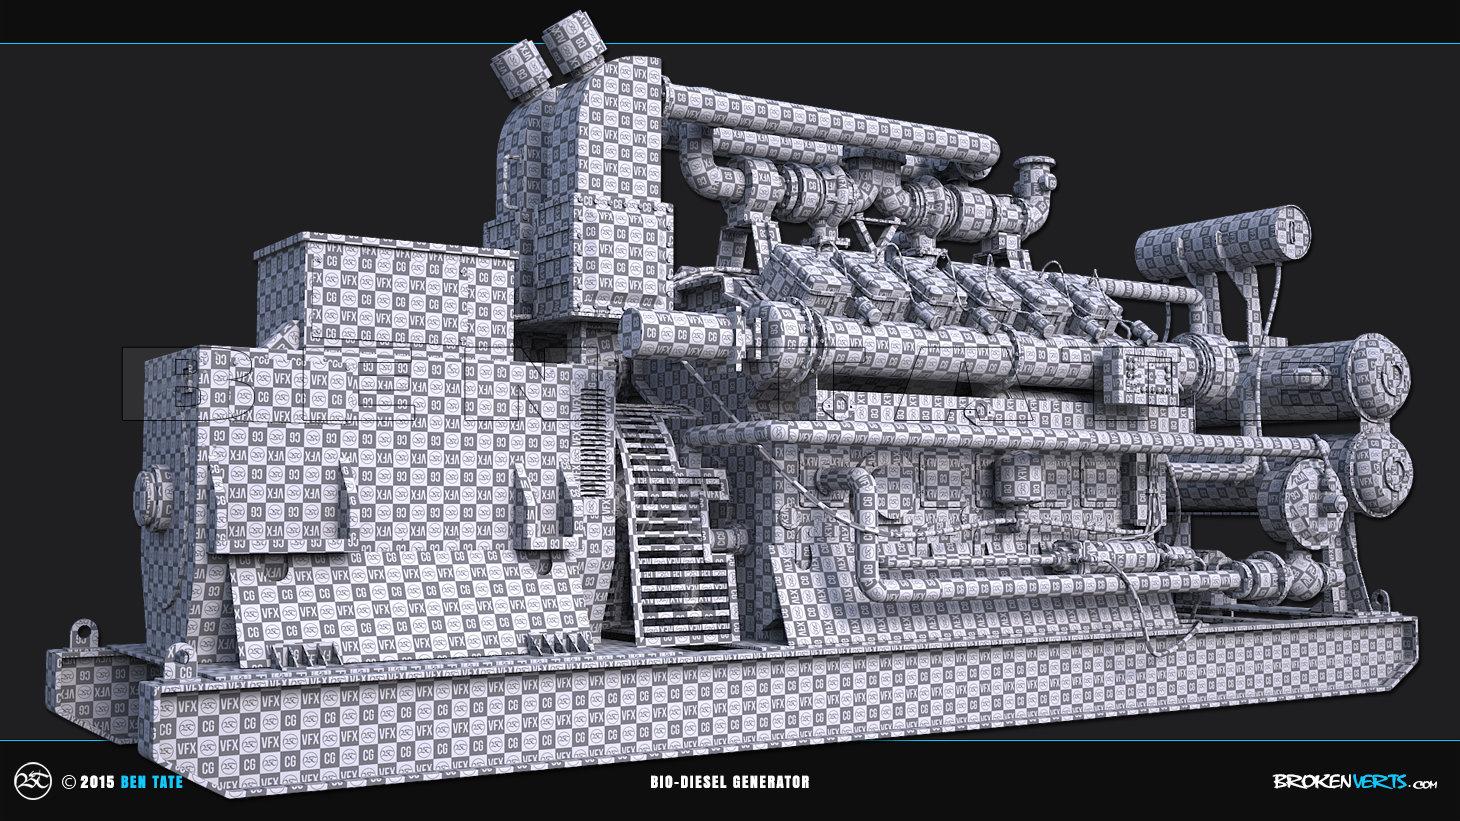 Bio-Diesel Generator Unwrapped UVs | Ben Tate | 3ds Max V-Ray Mari Photoshop